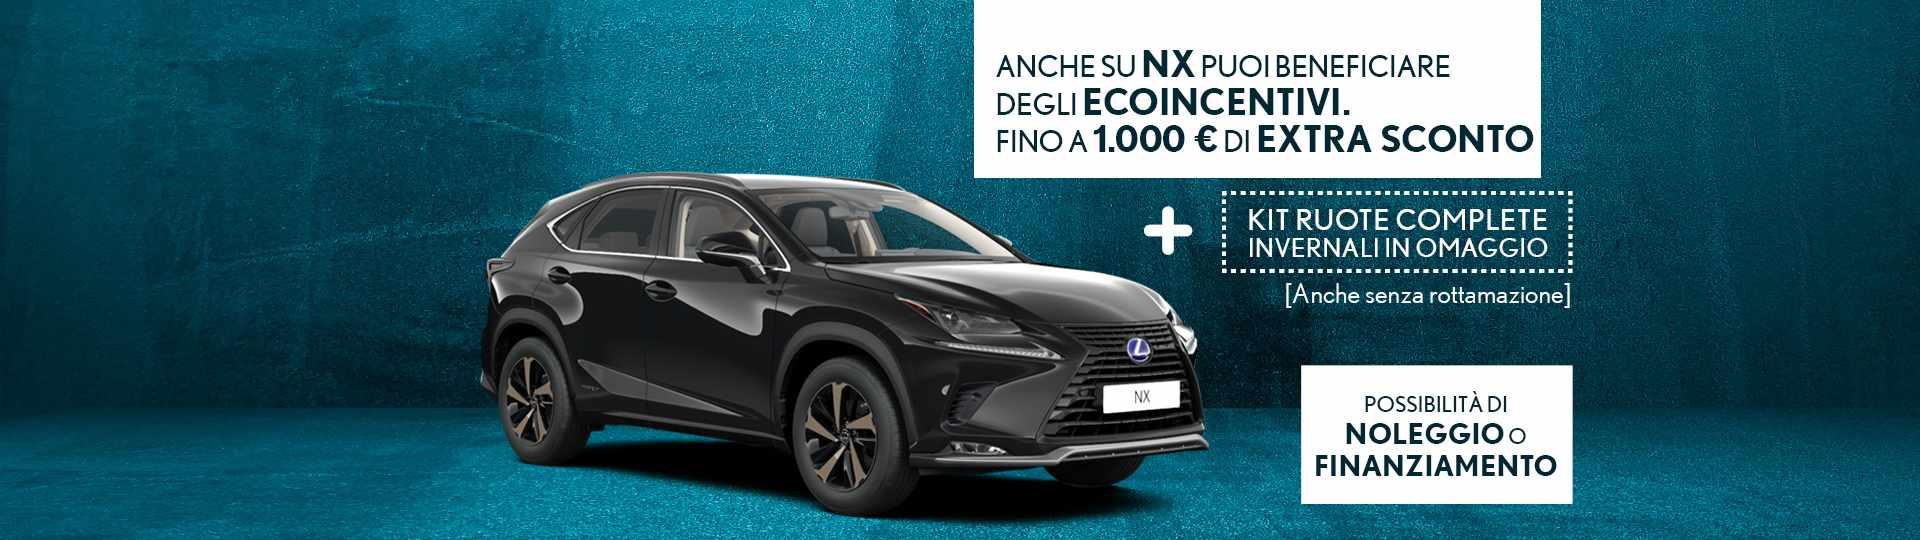 Lexus NX ecoincentivi_gennaio 2021_v2.jpg